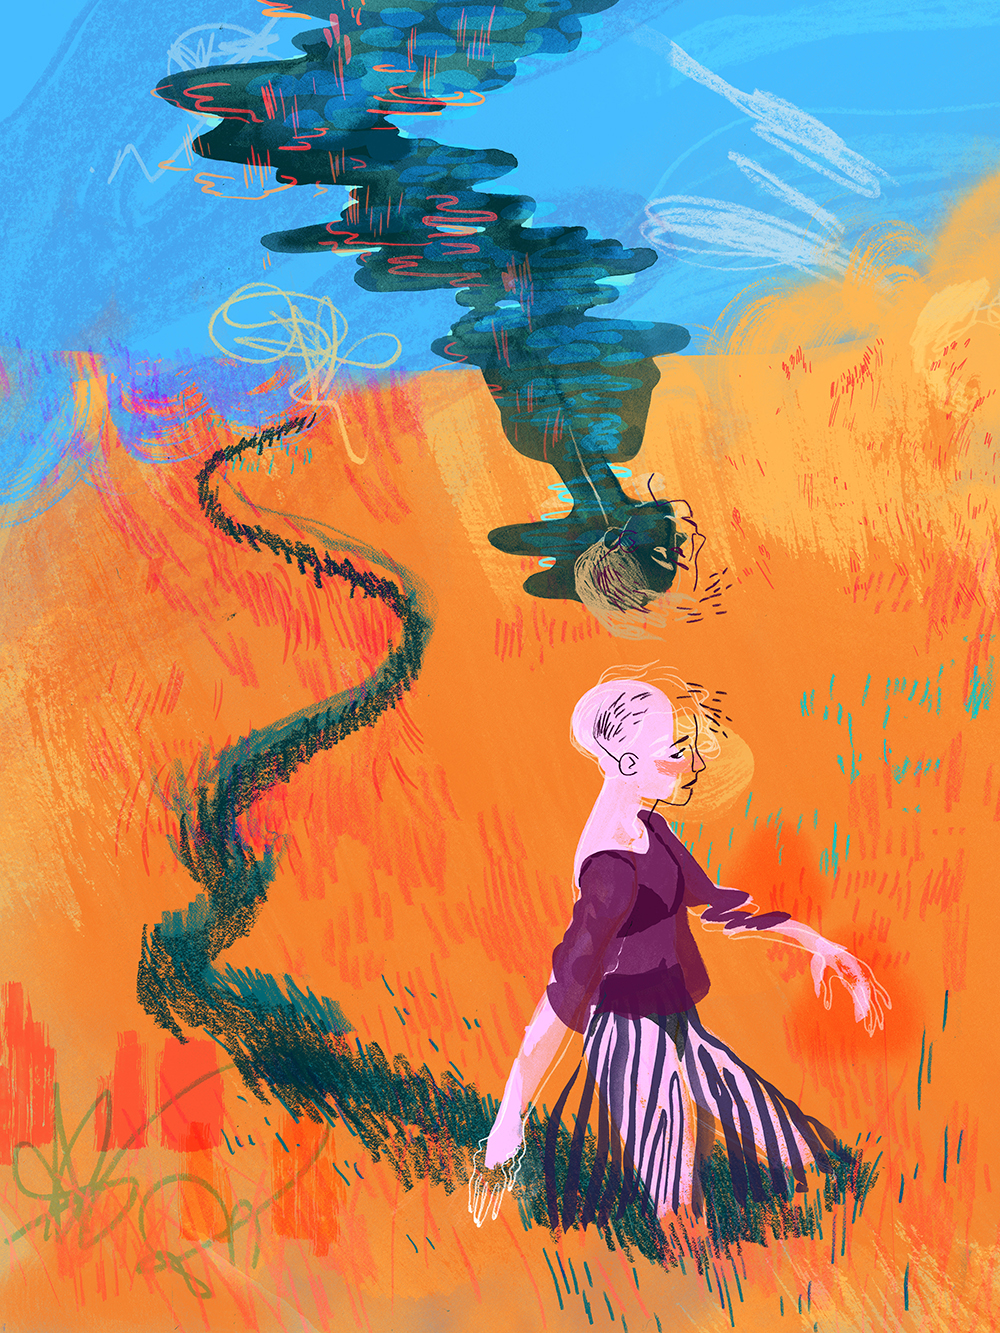 """Gold Field"" by Alyssa Van Hulle"